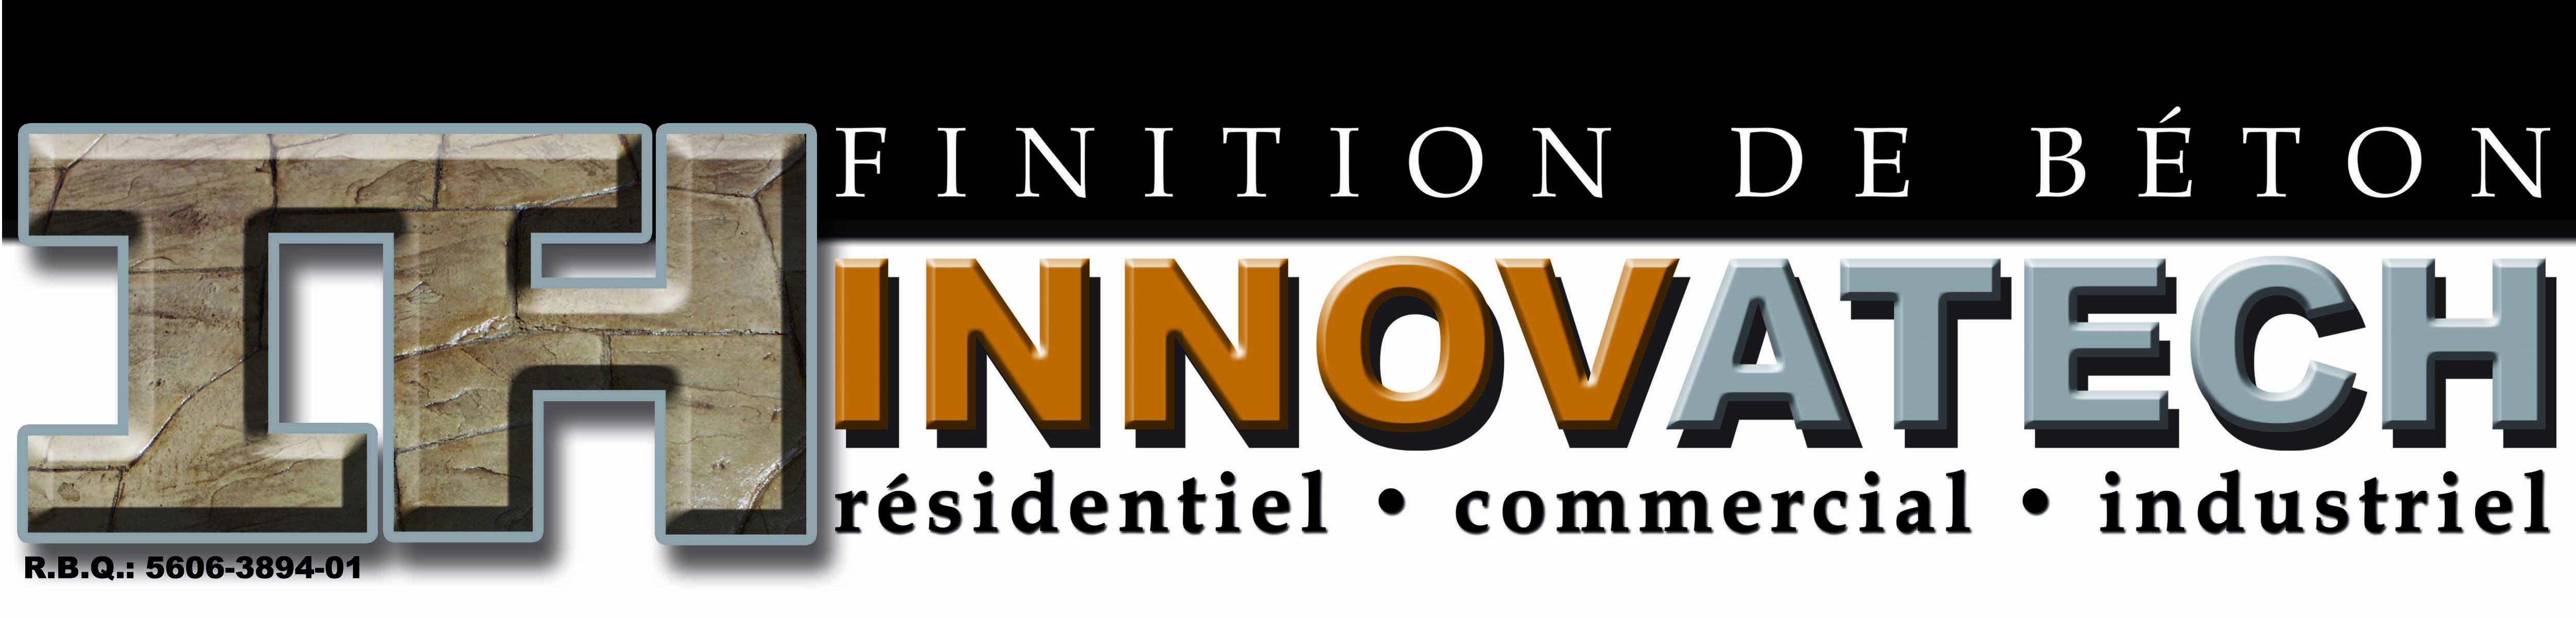 logo Béton Innovatech2